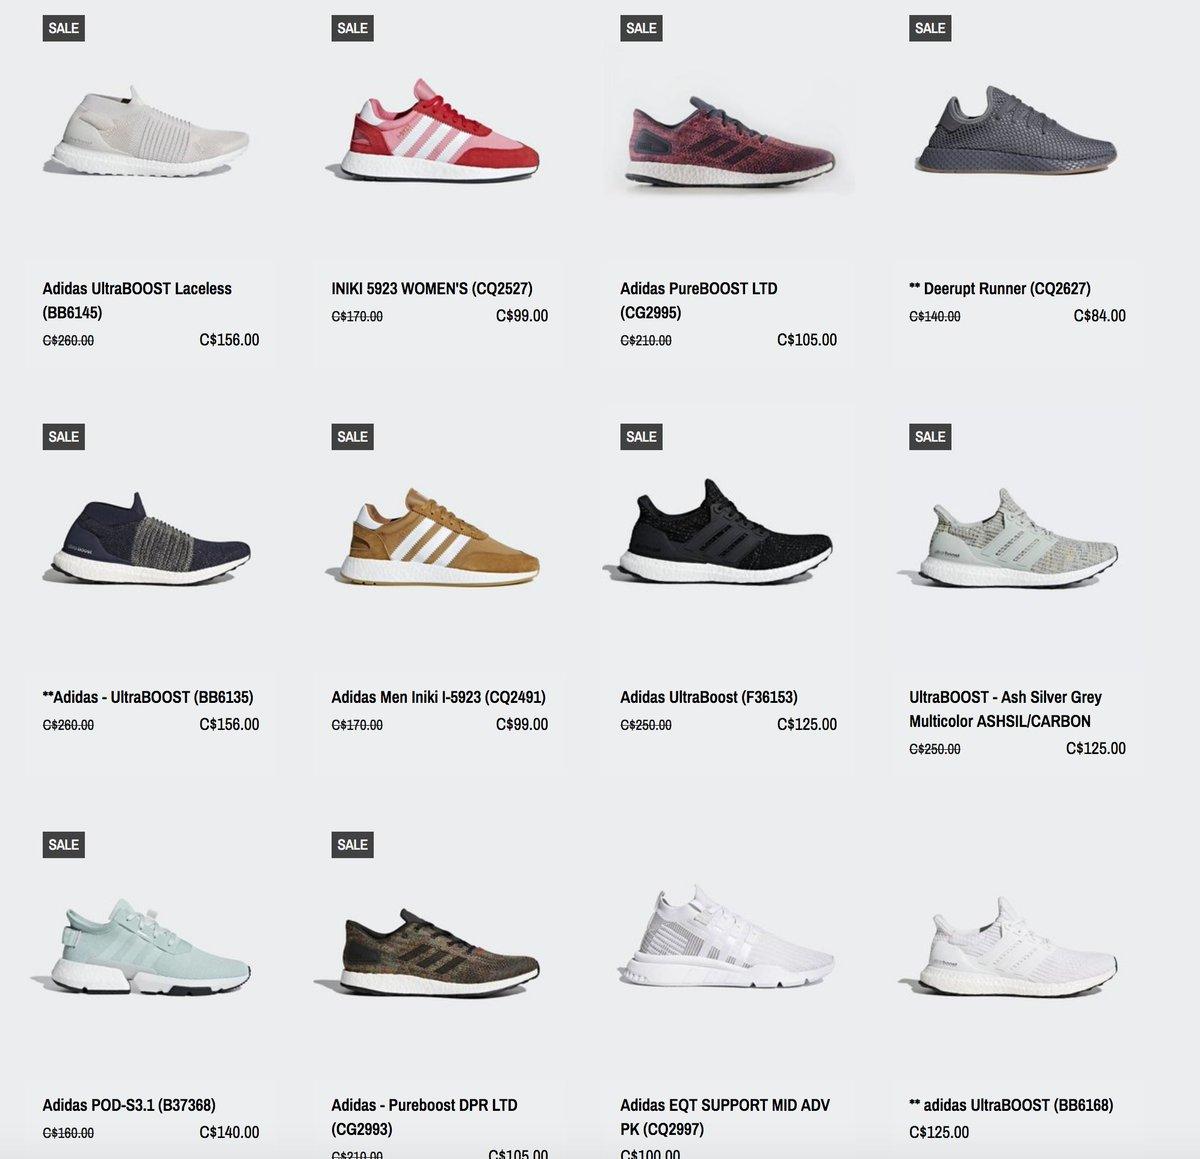 7ad08c1cbad37 Now 2 pairs for 250  (125  each pair) ! https   www.samtabak.com us adidas sale    adidas  ultraboost  boostpic.twitter.com MMAsPmb9Lp